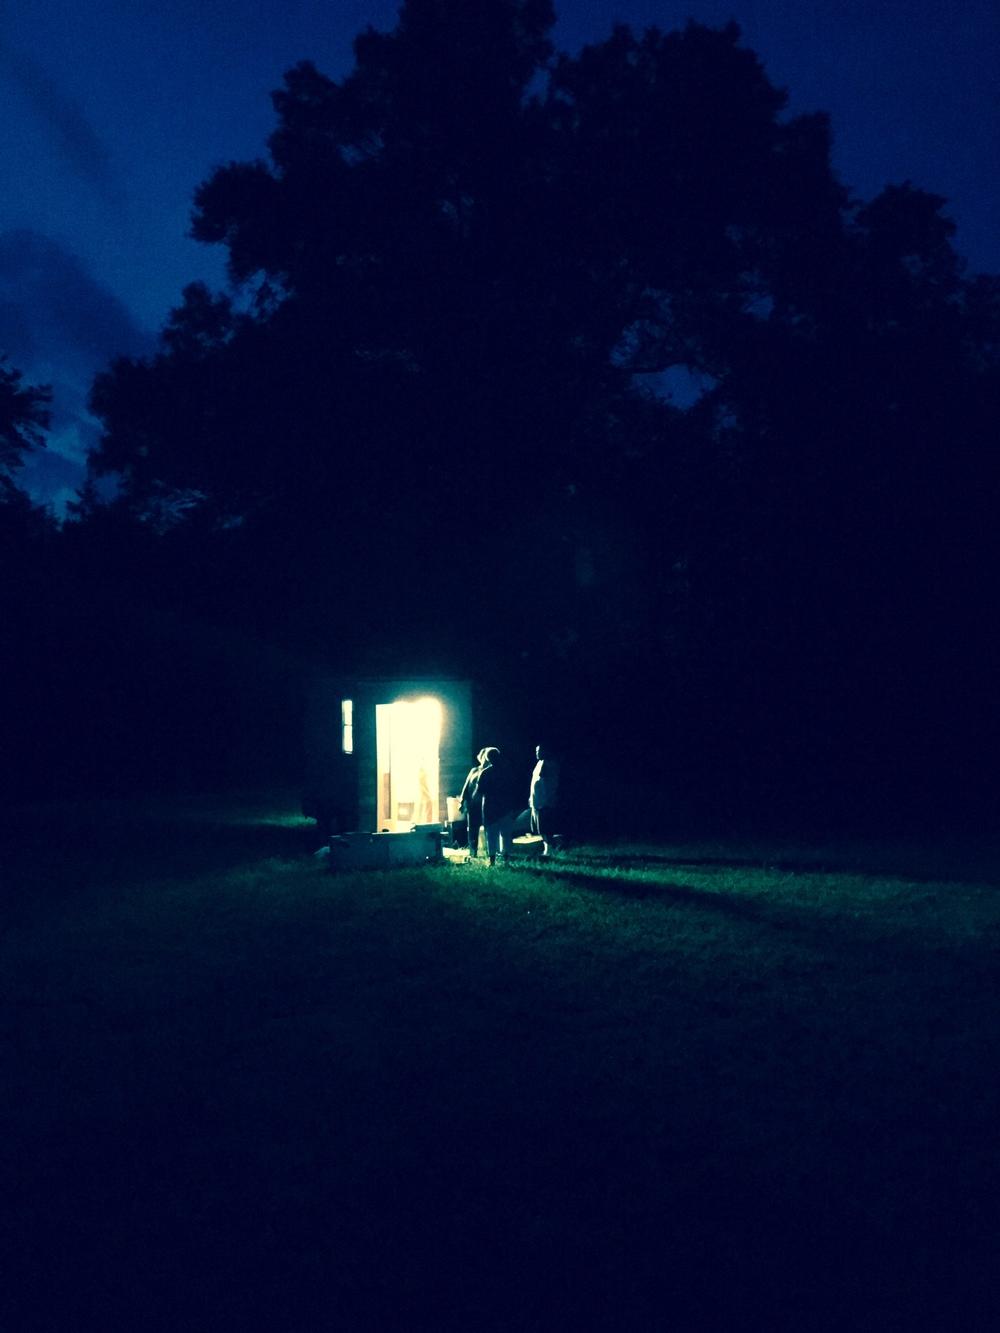 SSZ at night in Alamanace County, North Carolina.